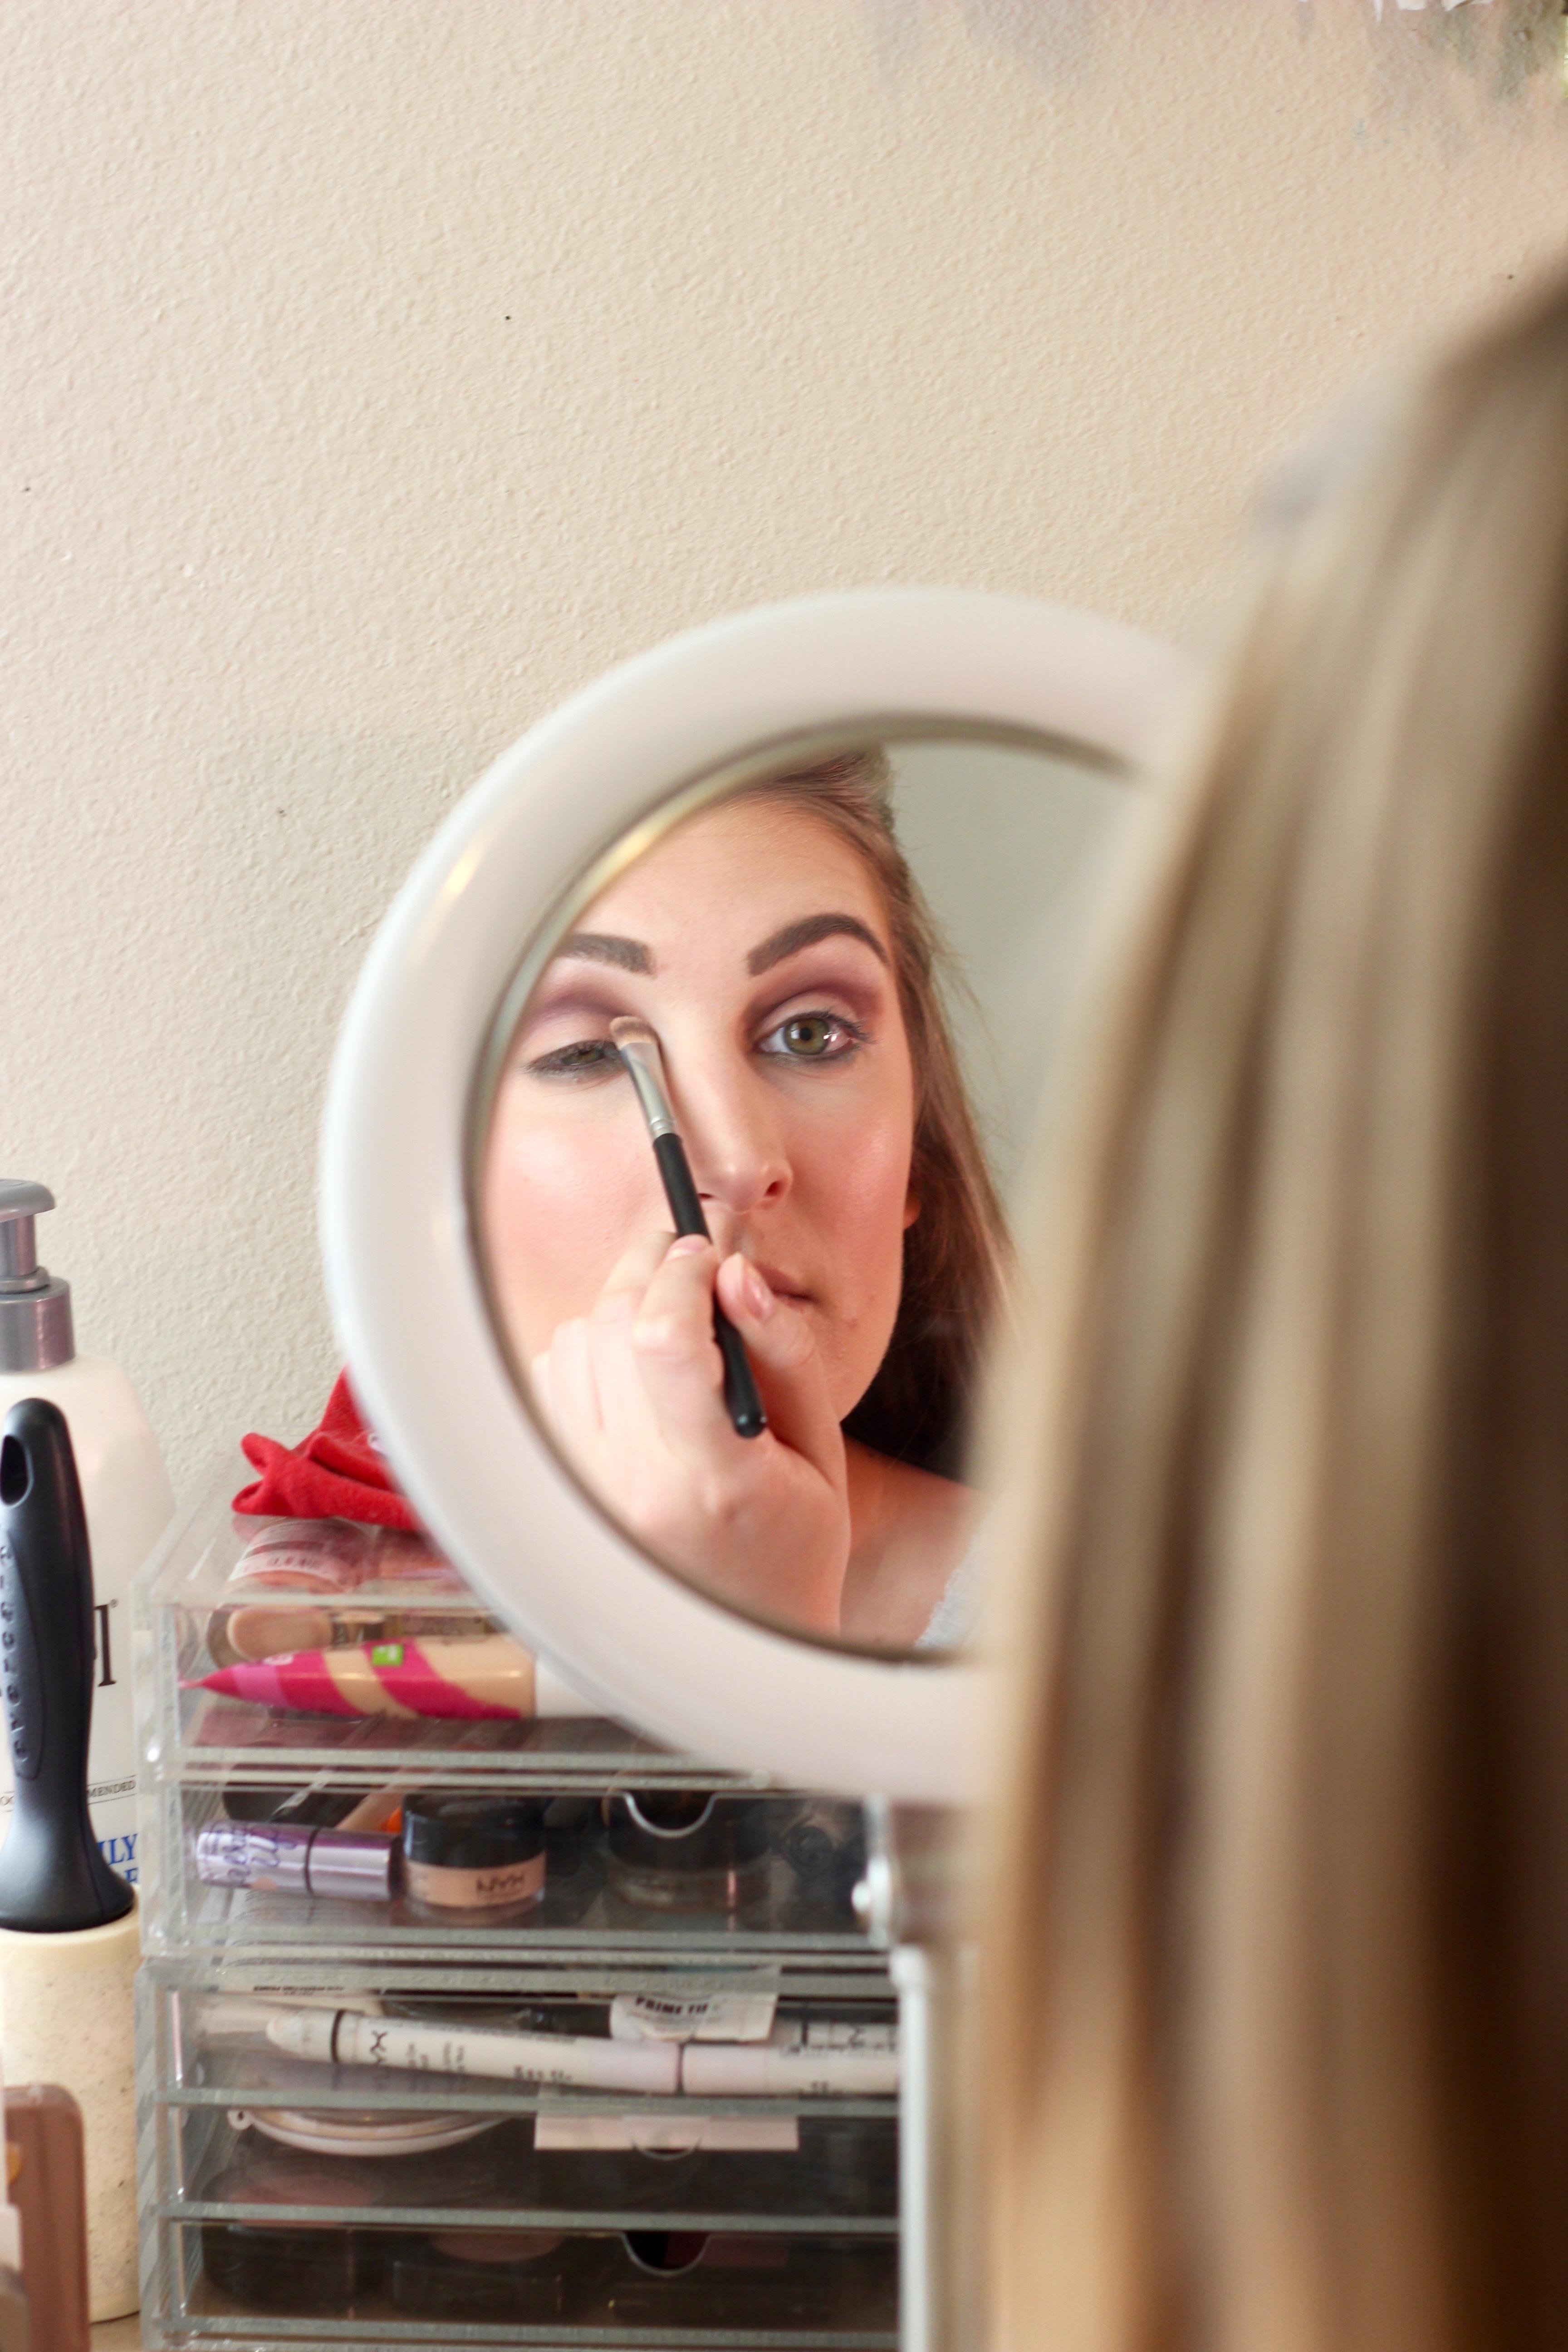 blend, eye makeup, mirror